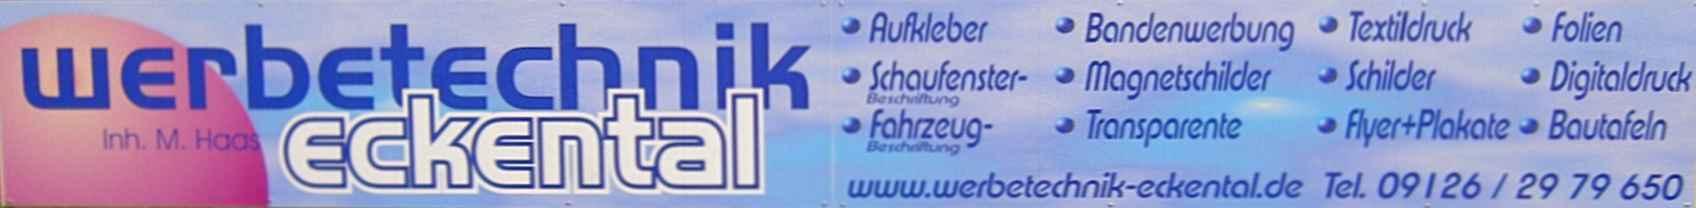 Werbetechnik Eckental